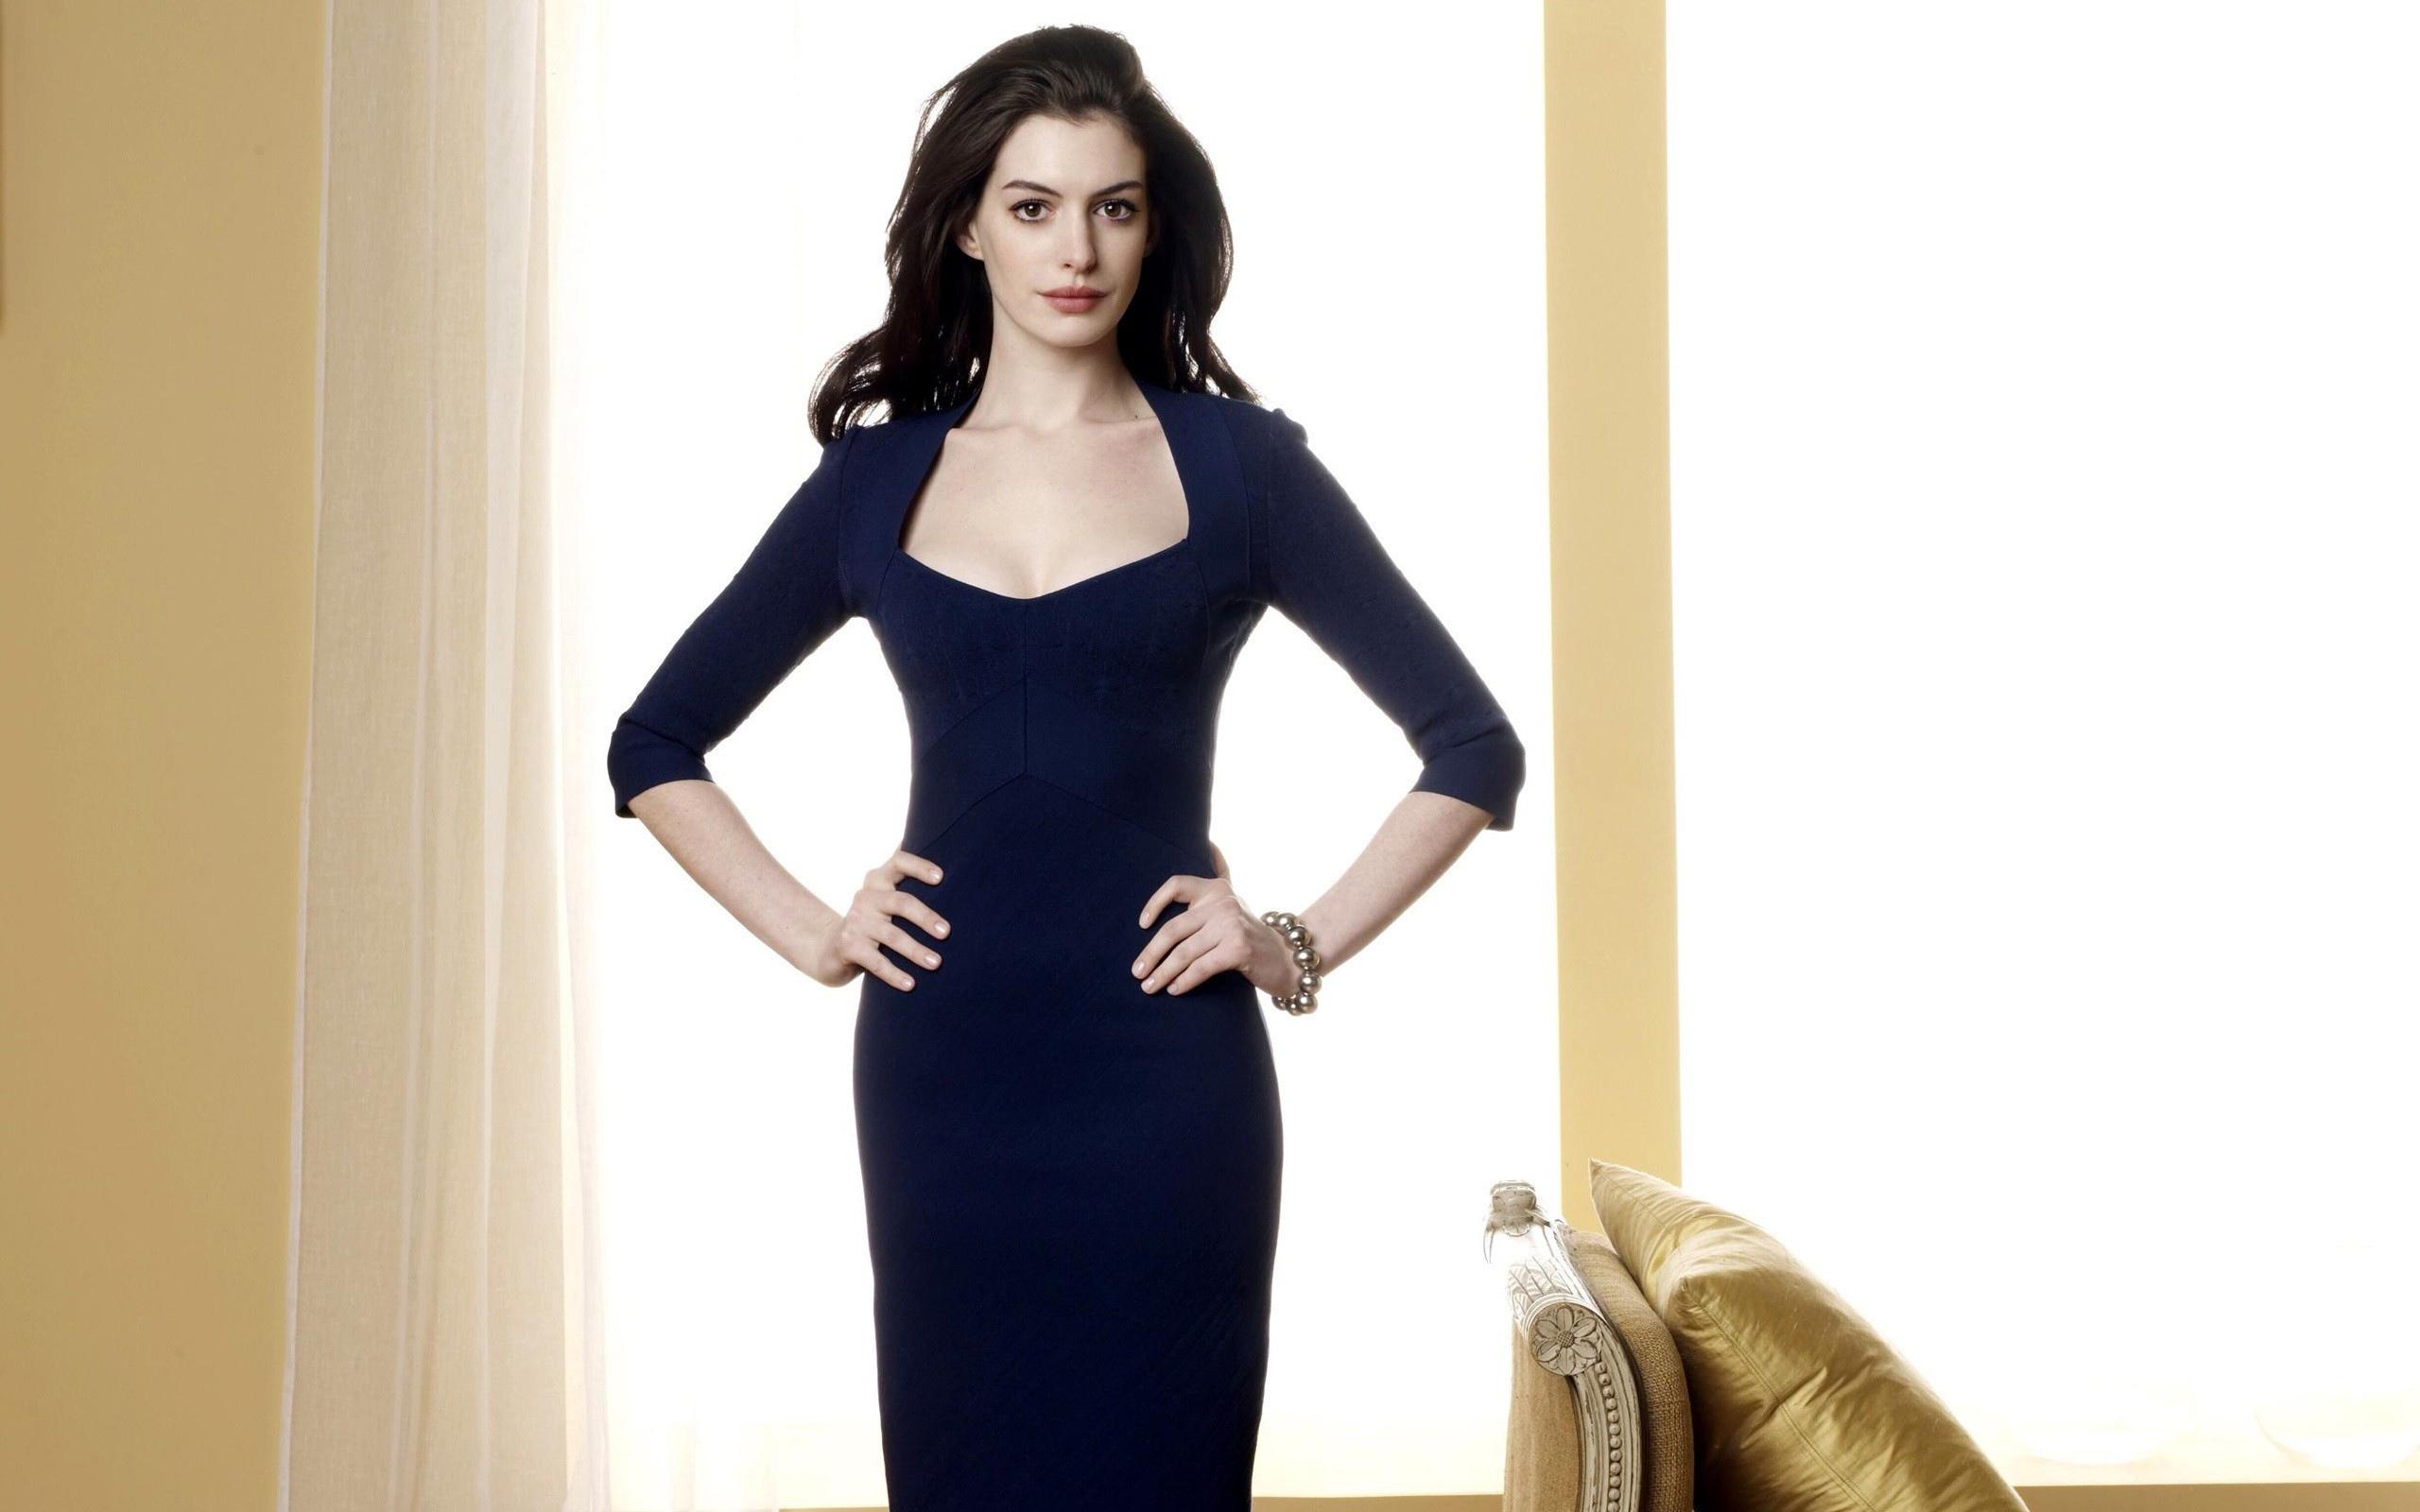 Facebook Covers For Anne Hathaway • PoPoPics.com энн хэтэуэй